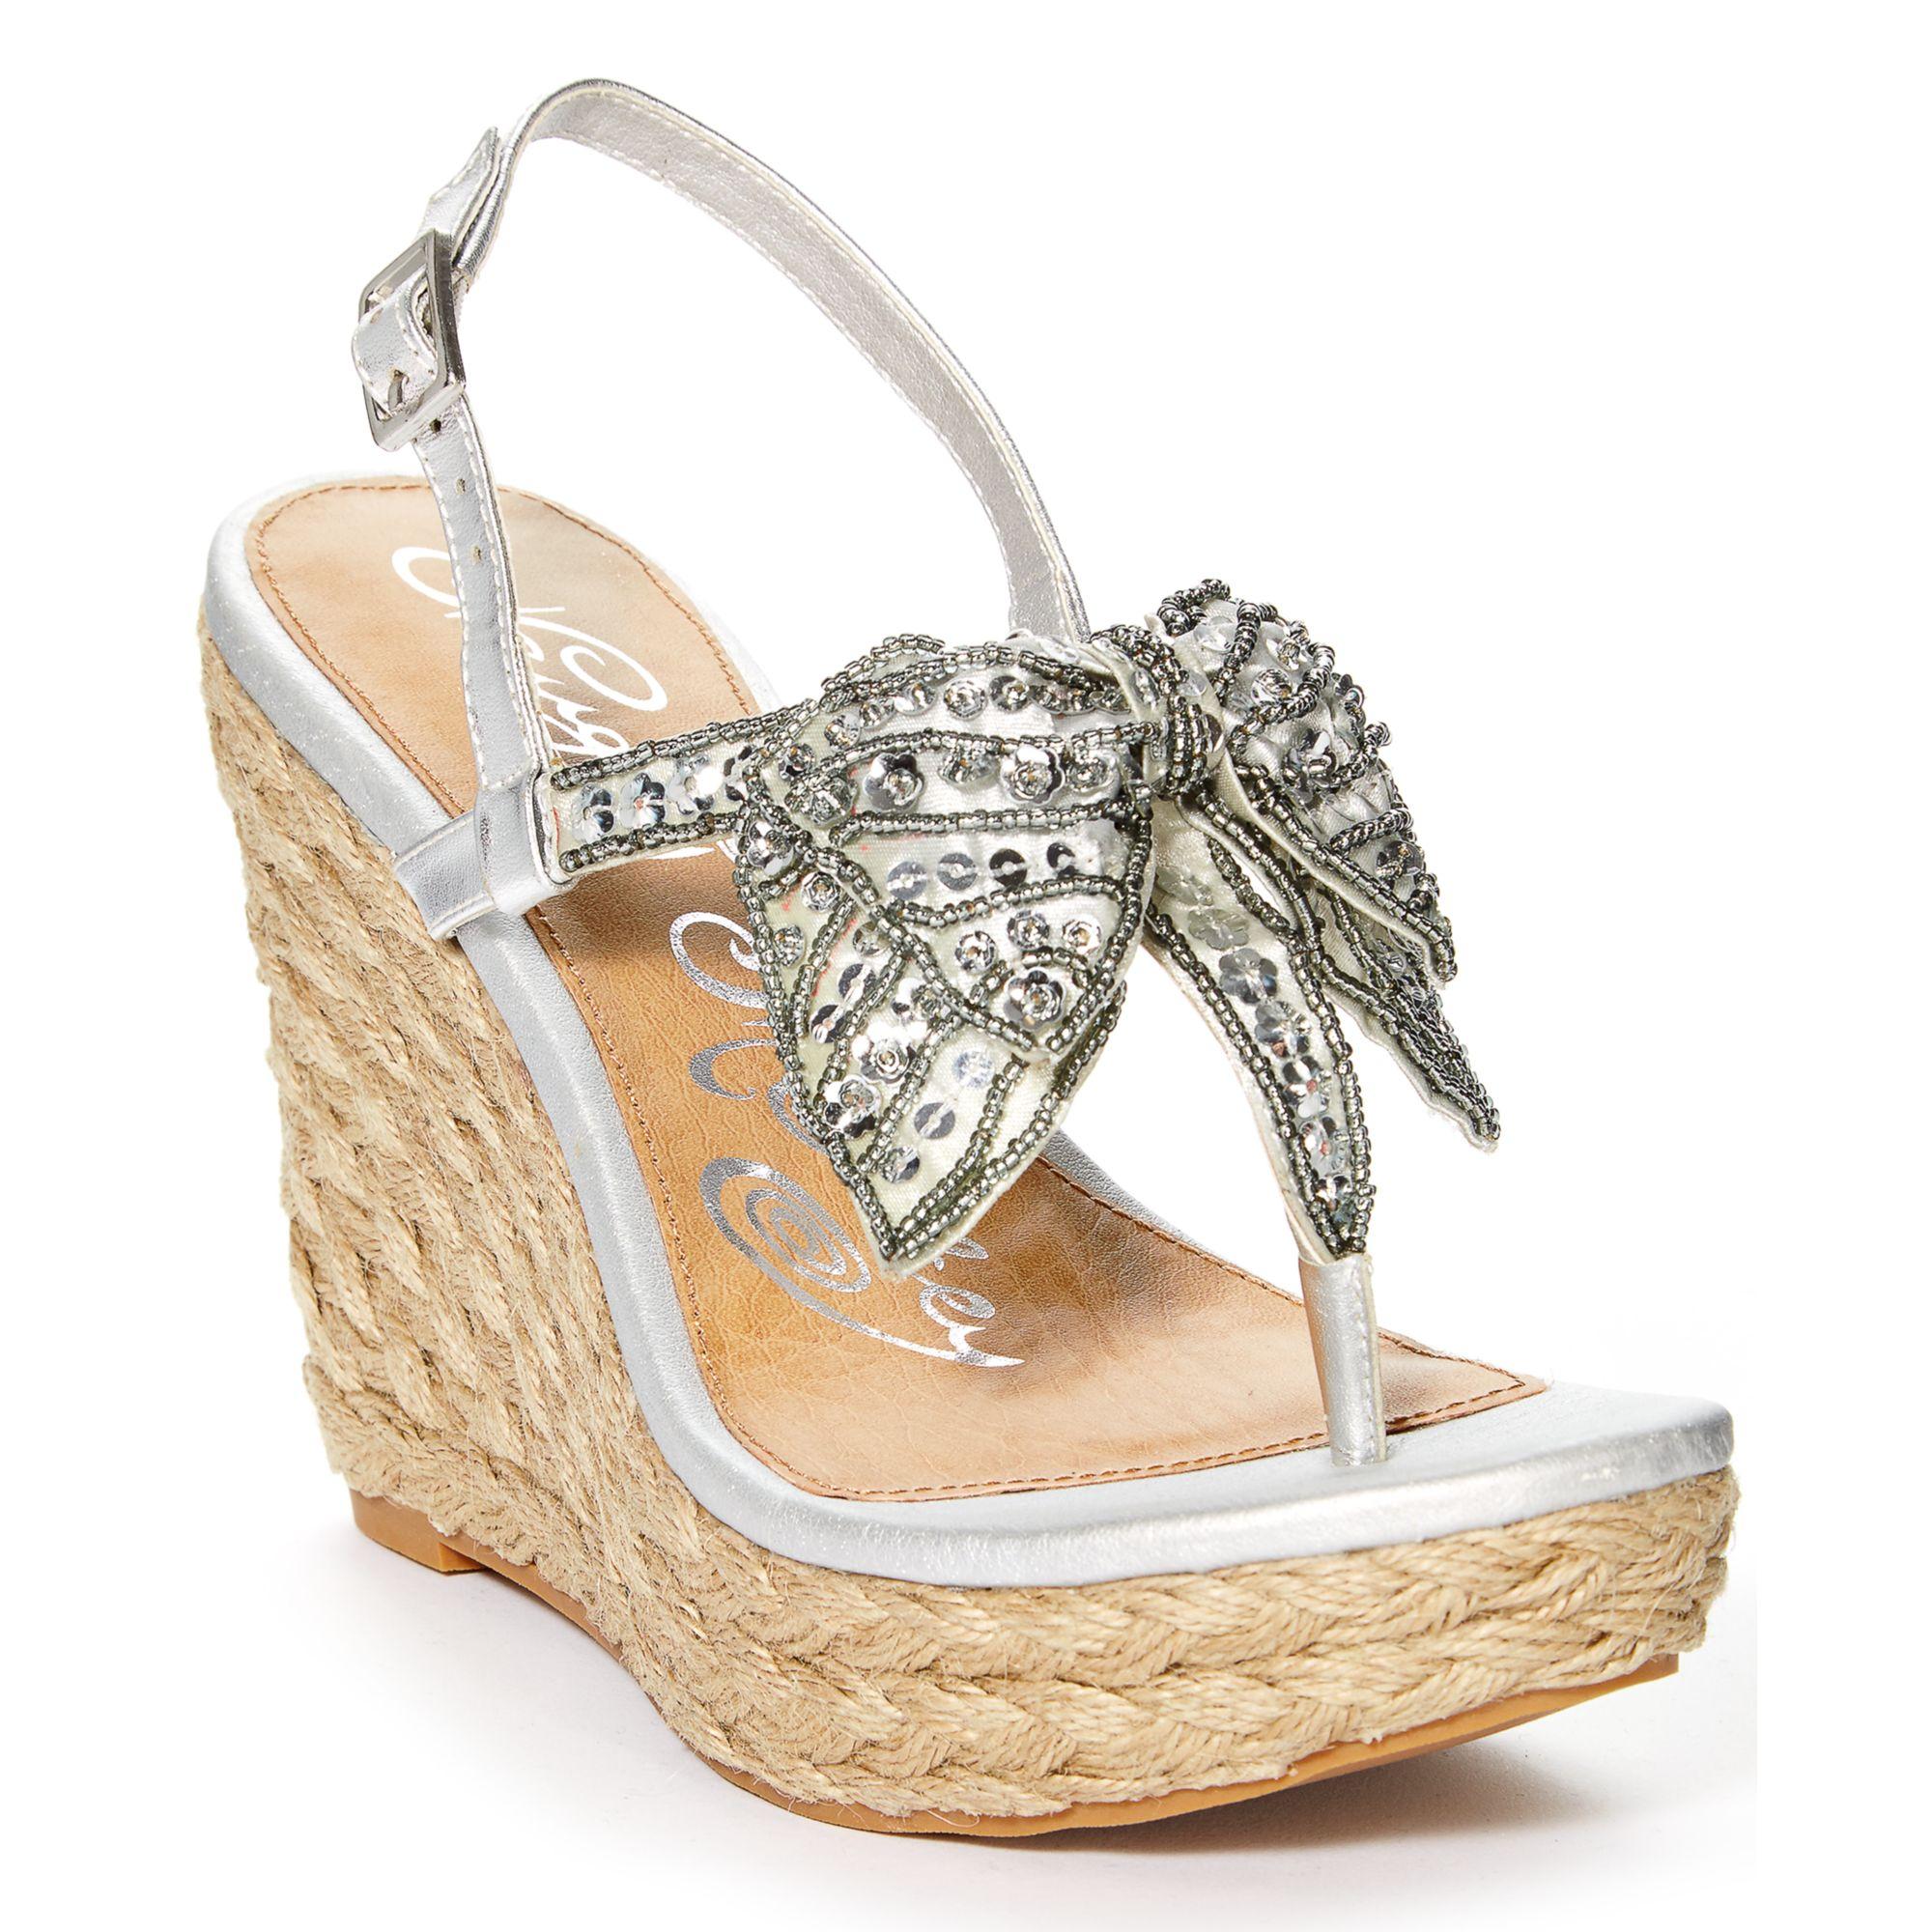 6e5e5f798 Lyst - Naughty Monkey Feel Free Platform Wedge Thong Sandals in Metallic